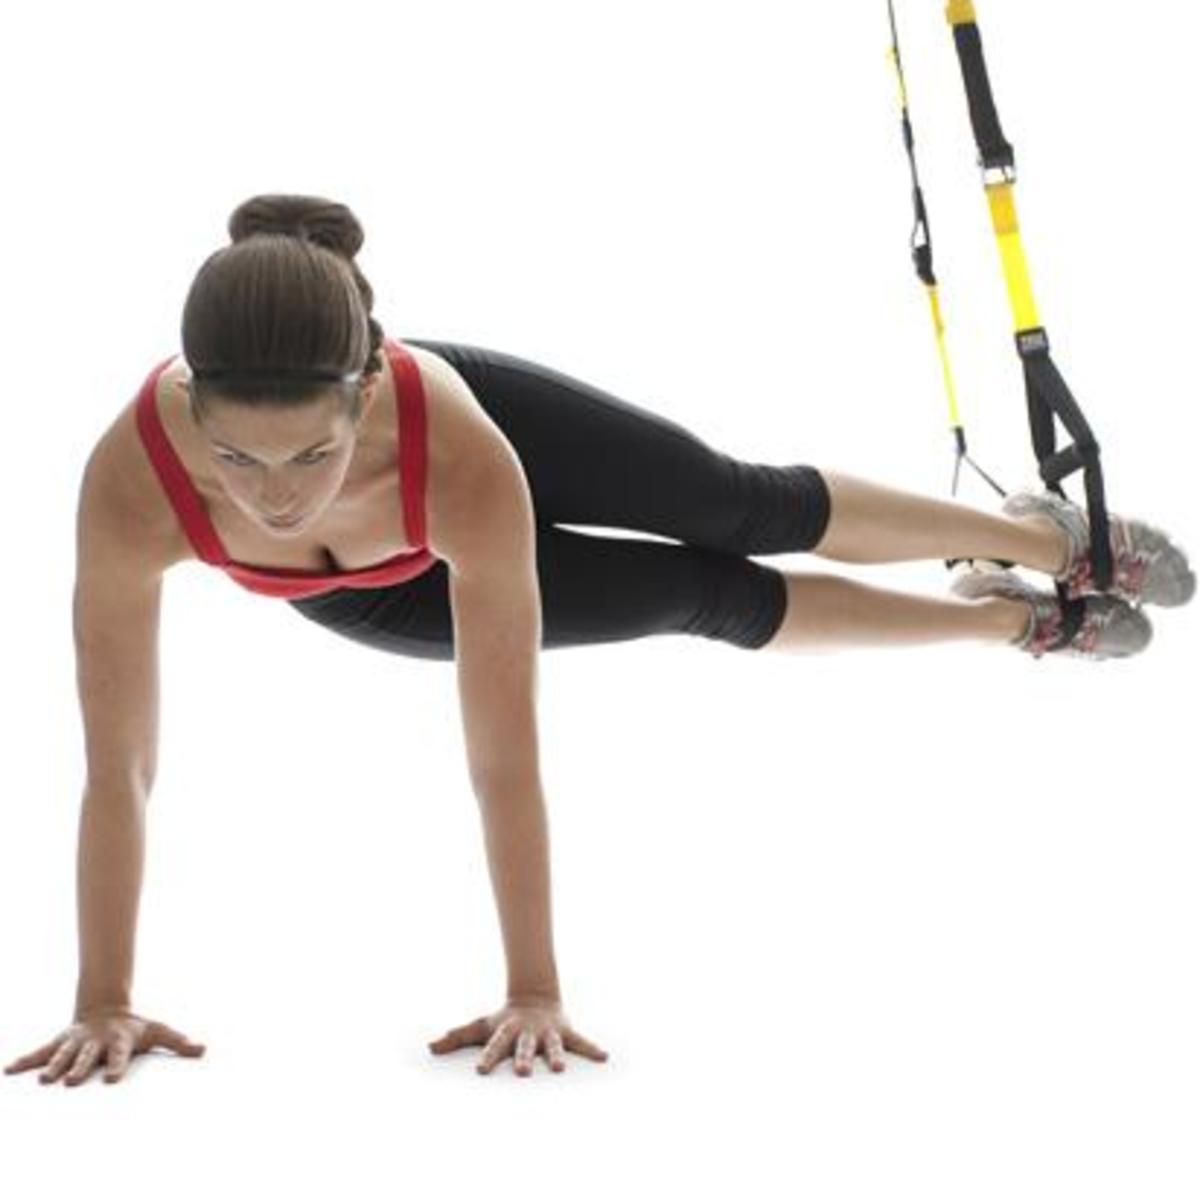 A pendulum exercise using TRX.